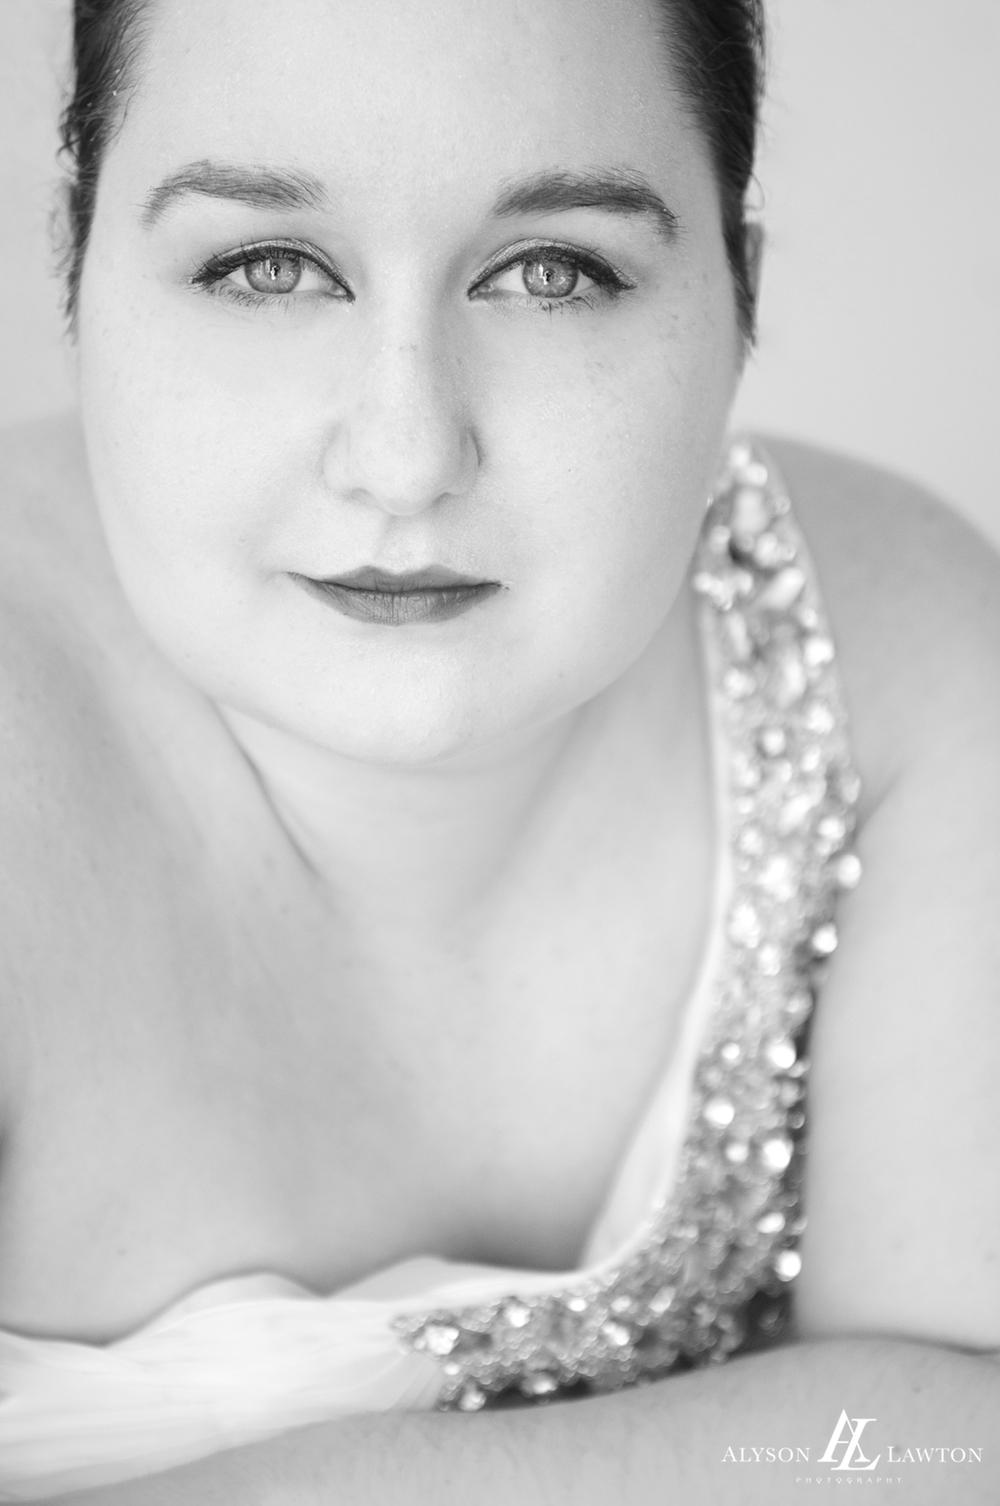 { North Carolina Wedding & Beauty Photographer | Sarah| Winston-Salem, NC | Alyson Lawton Photography | www.alysonlawton.com }